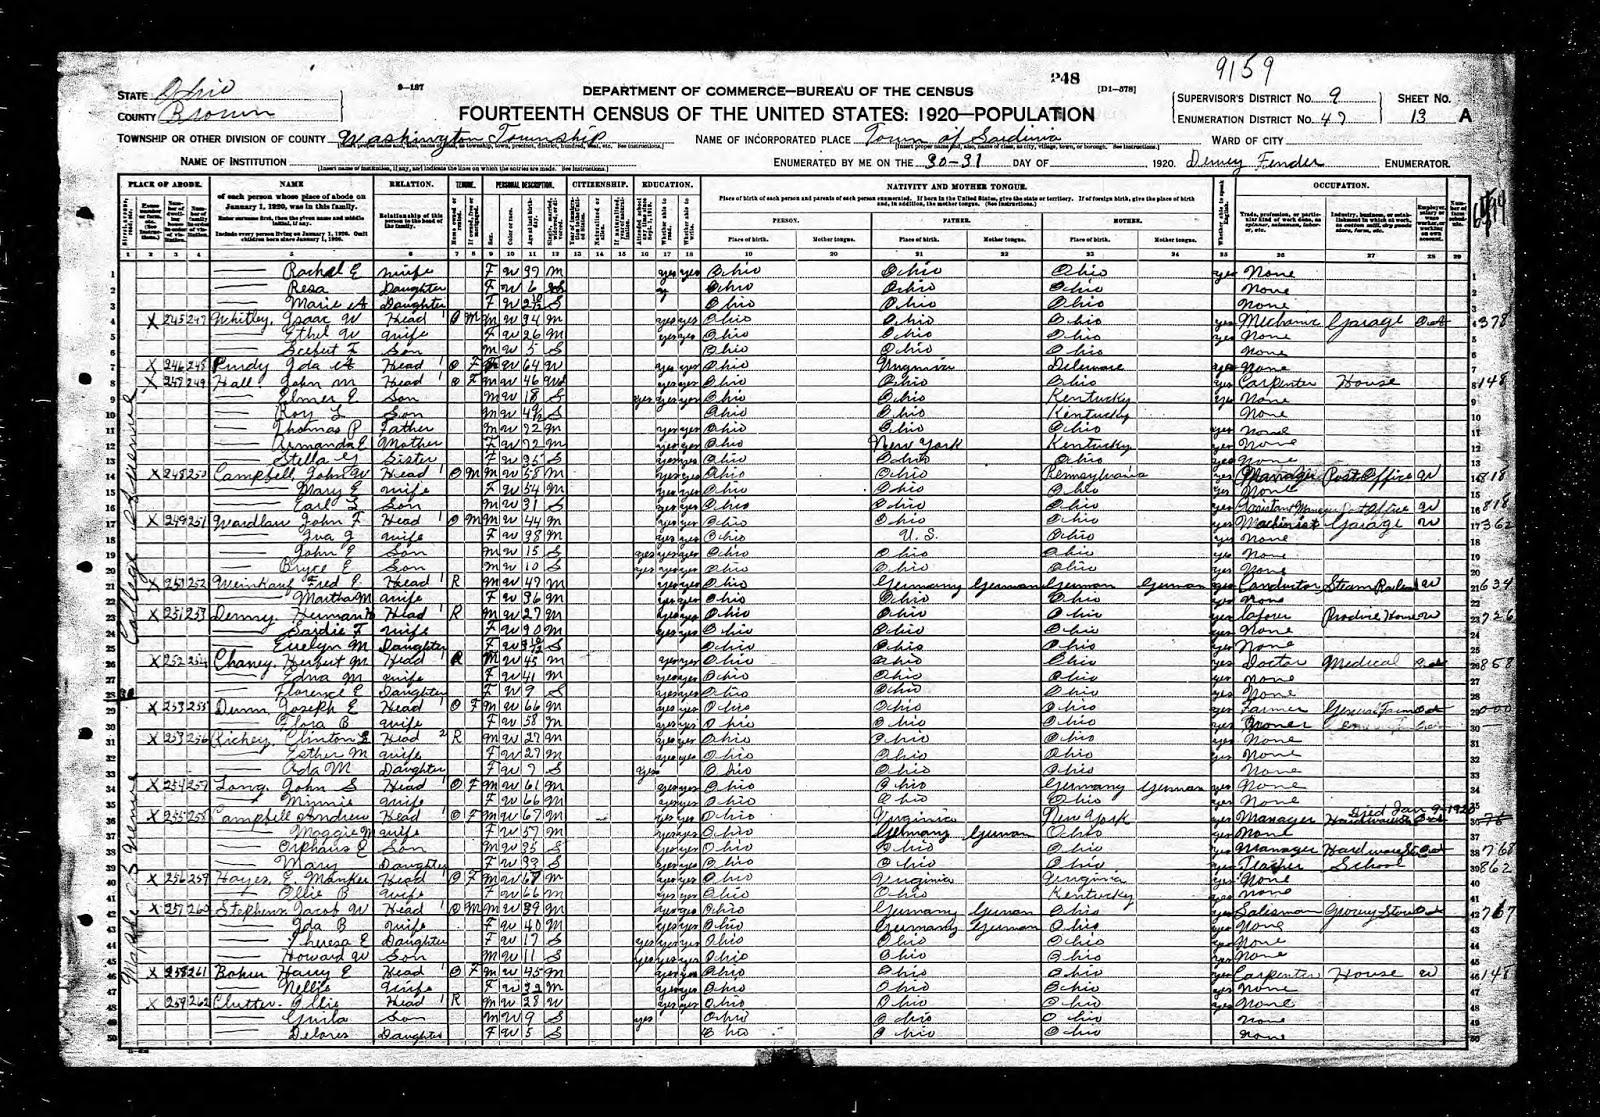 Ohio brown county sardinia - 1920 Us Census Brown County Ohio Population Schedule Sardinia Washington Township Enumeration District Ed 47 Sd 9 Sheet 13a Dwelling 249